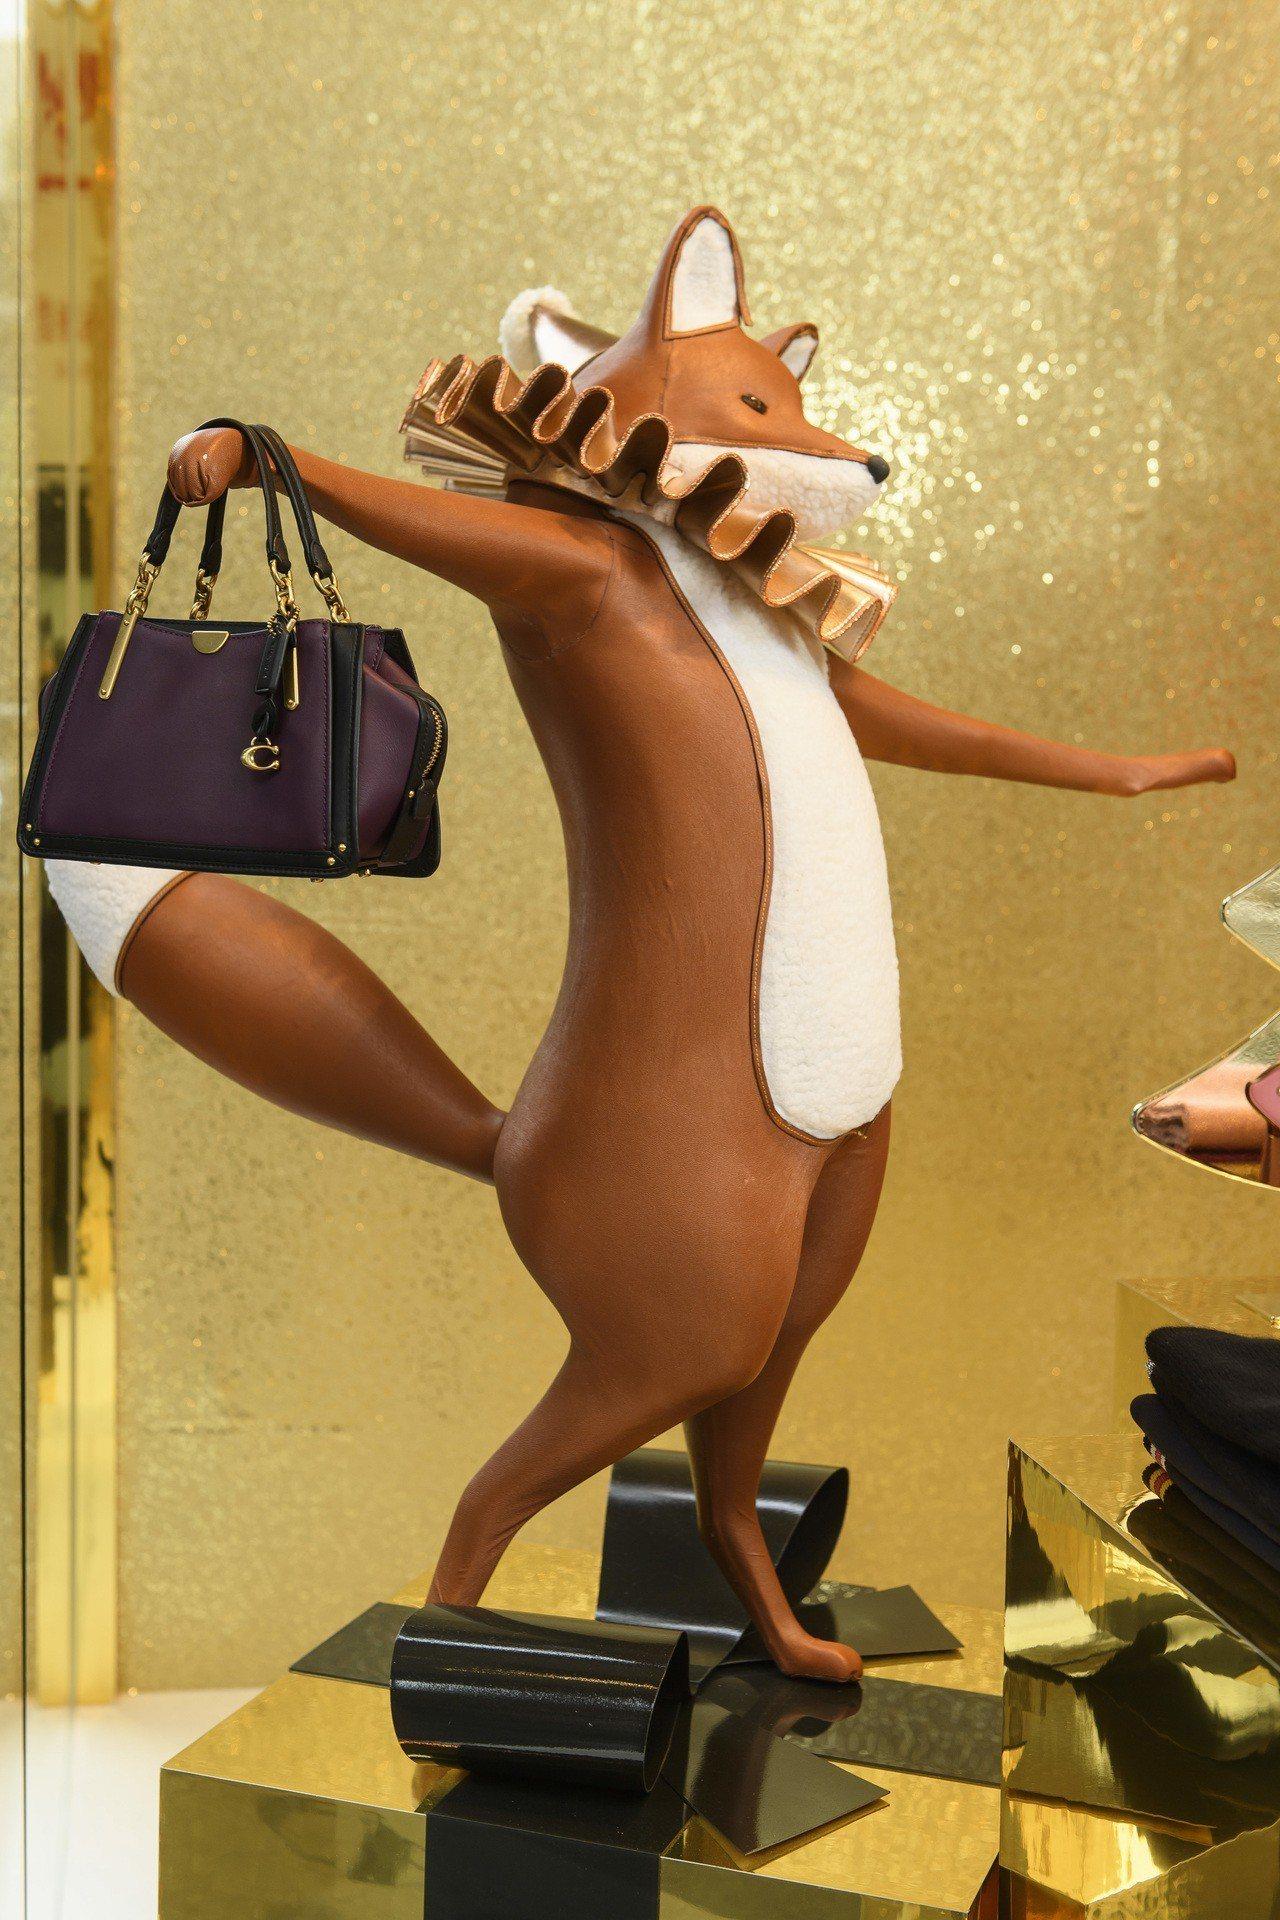 COACH Holiday系列限定概念店有超可愛的小豬、青蛙、狐狸等公仔陳列。圖...